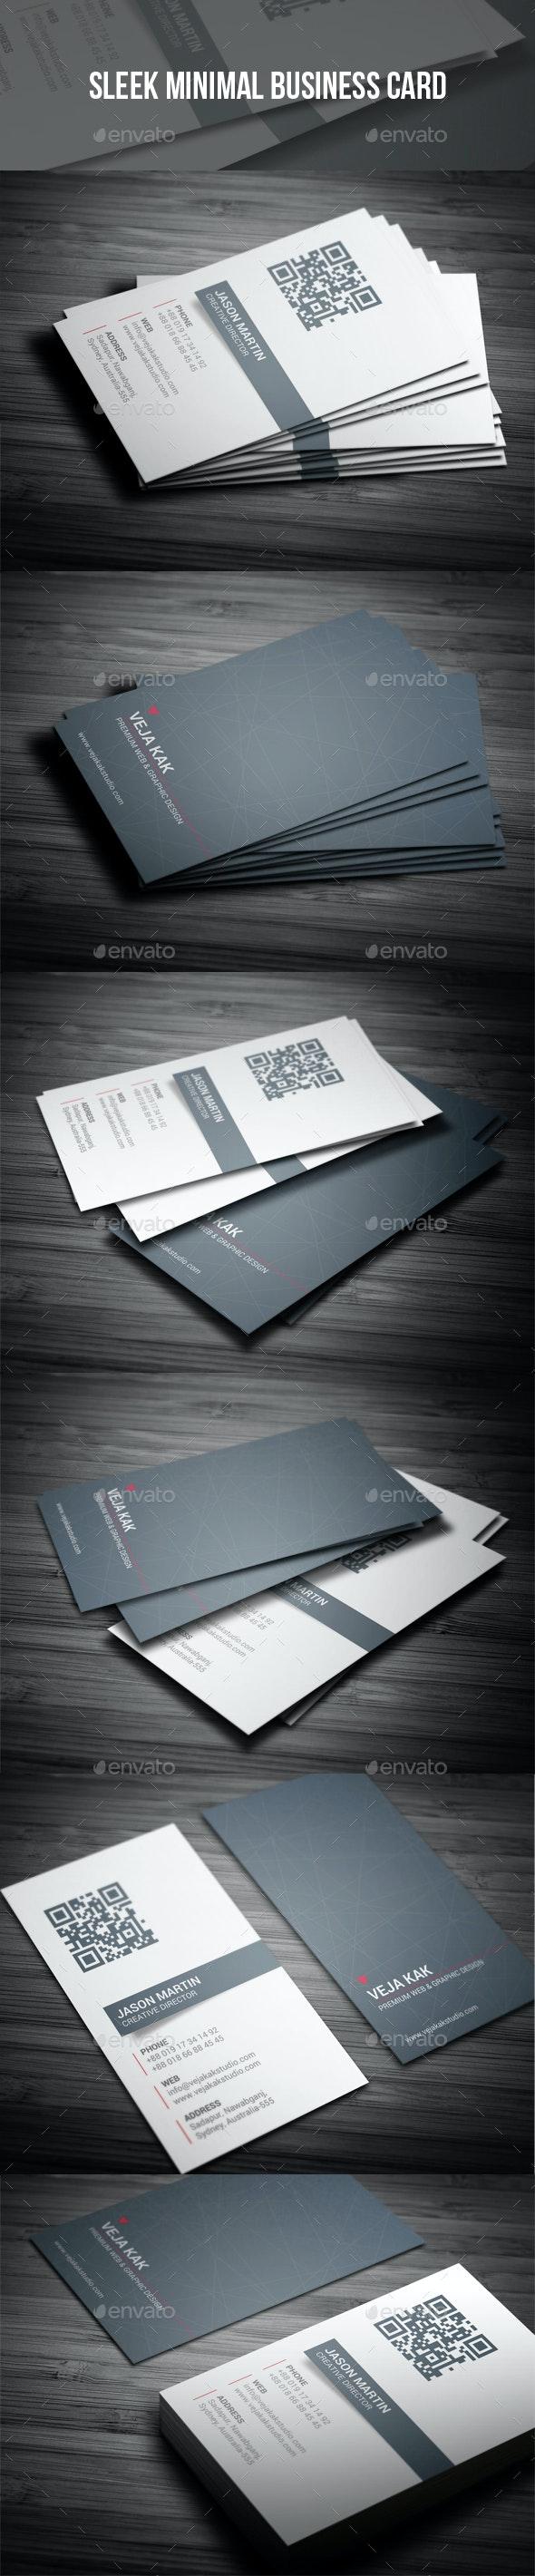 Sleek Minimal Business Card - Creative Business Cards